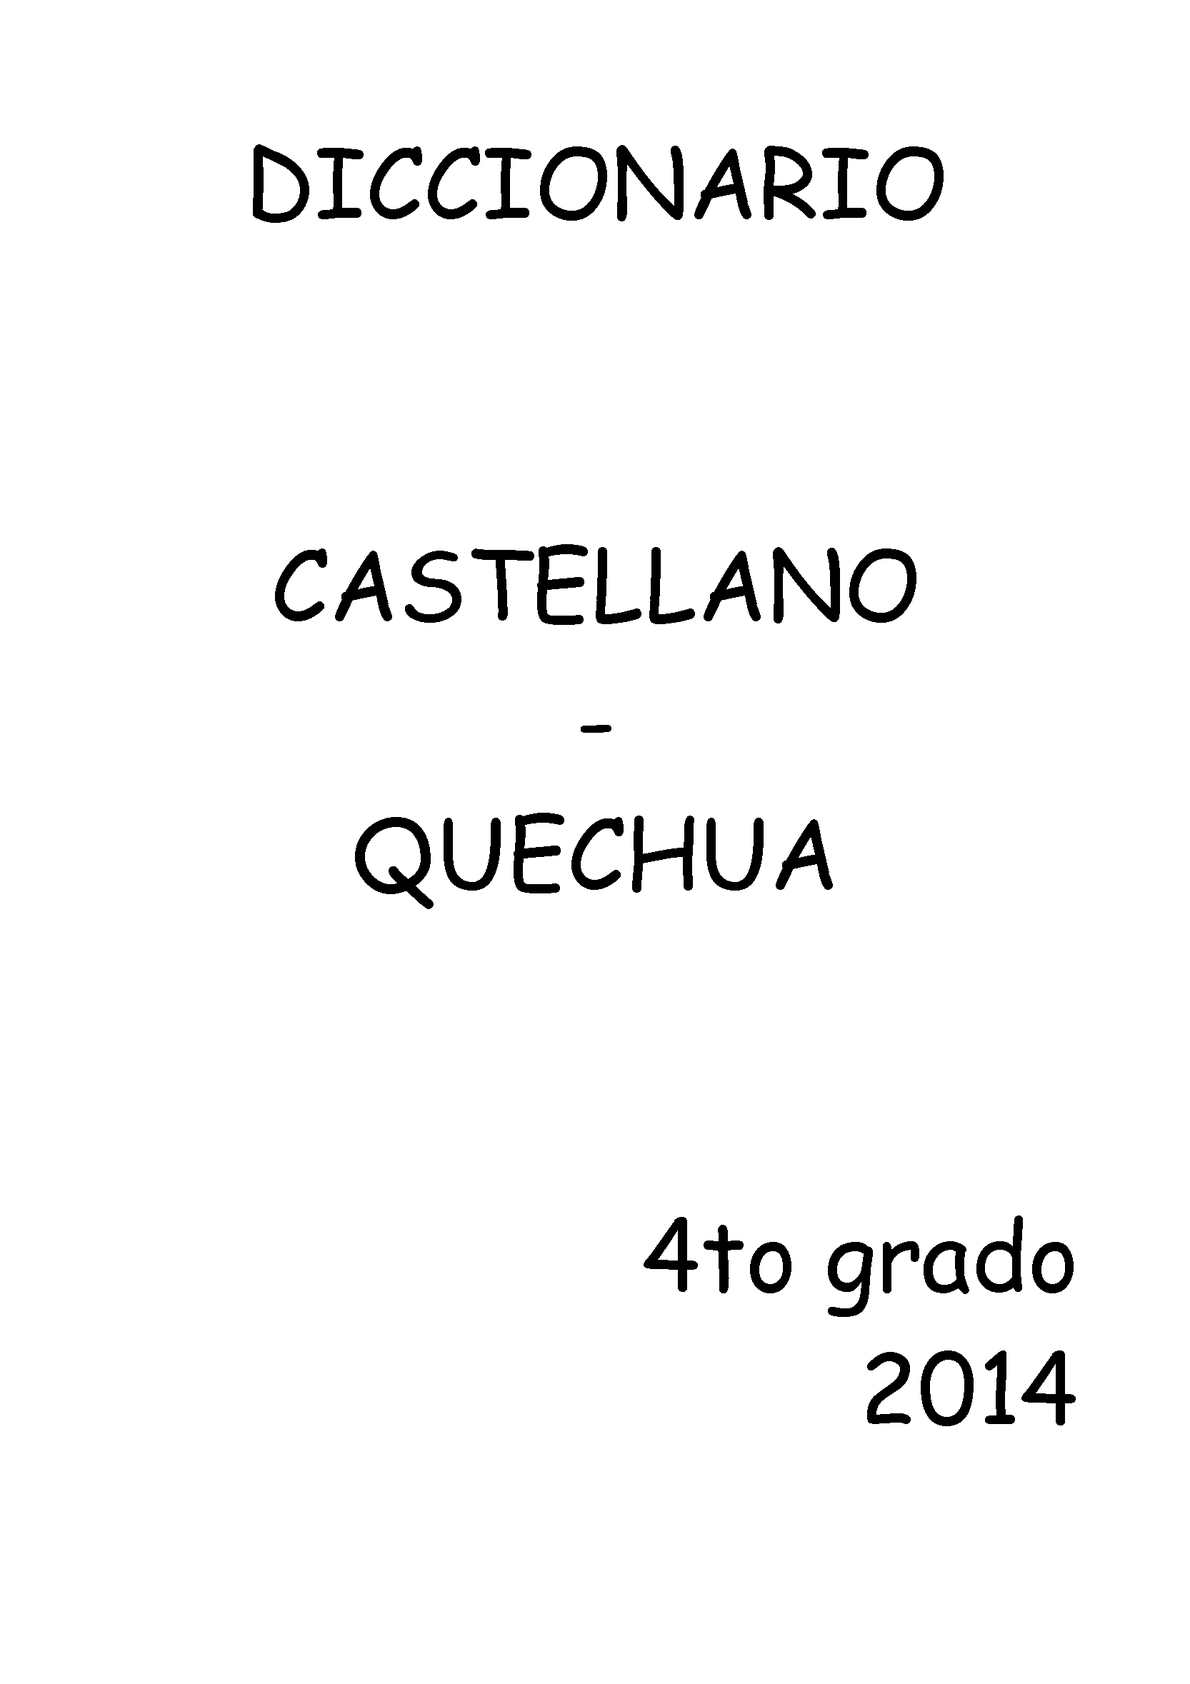 Quechua Calaméo Diccionario Diccionario Castellano Calaméo Diccionario Castellano Calaméo Quechua j3RLAq54